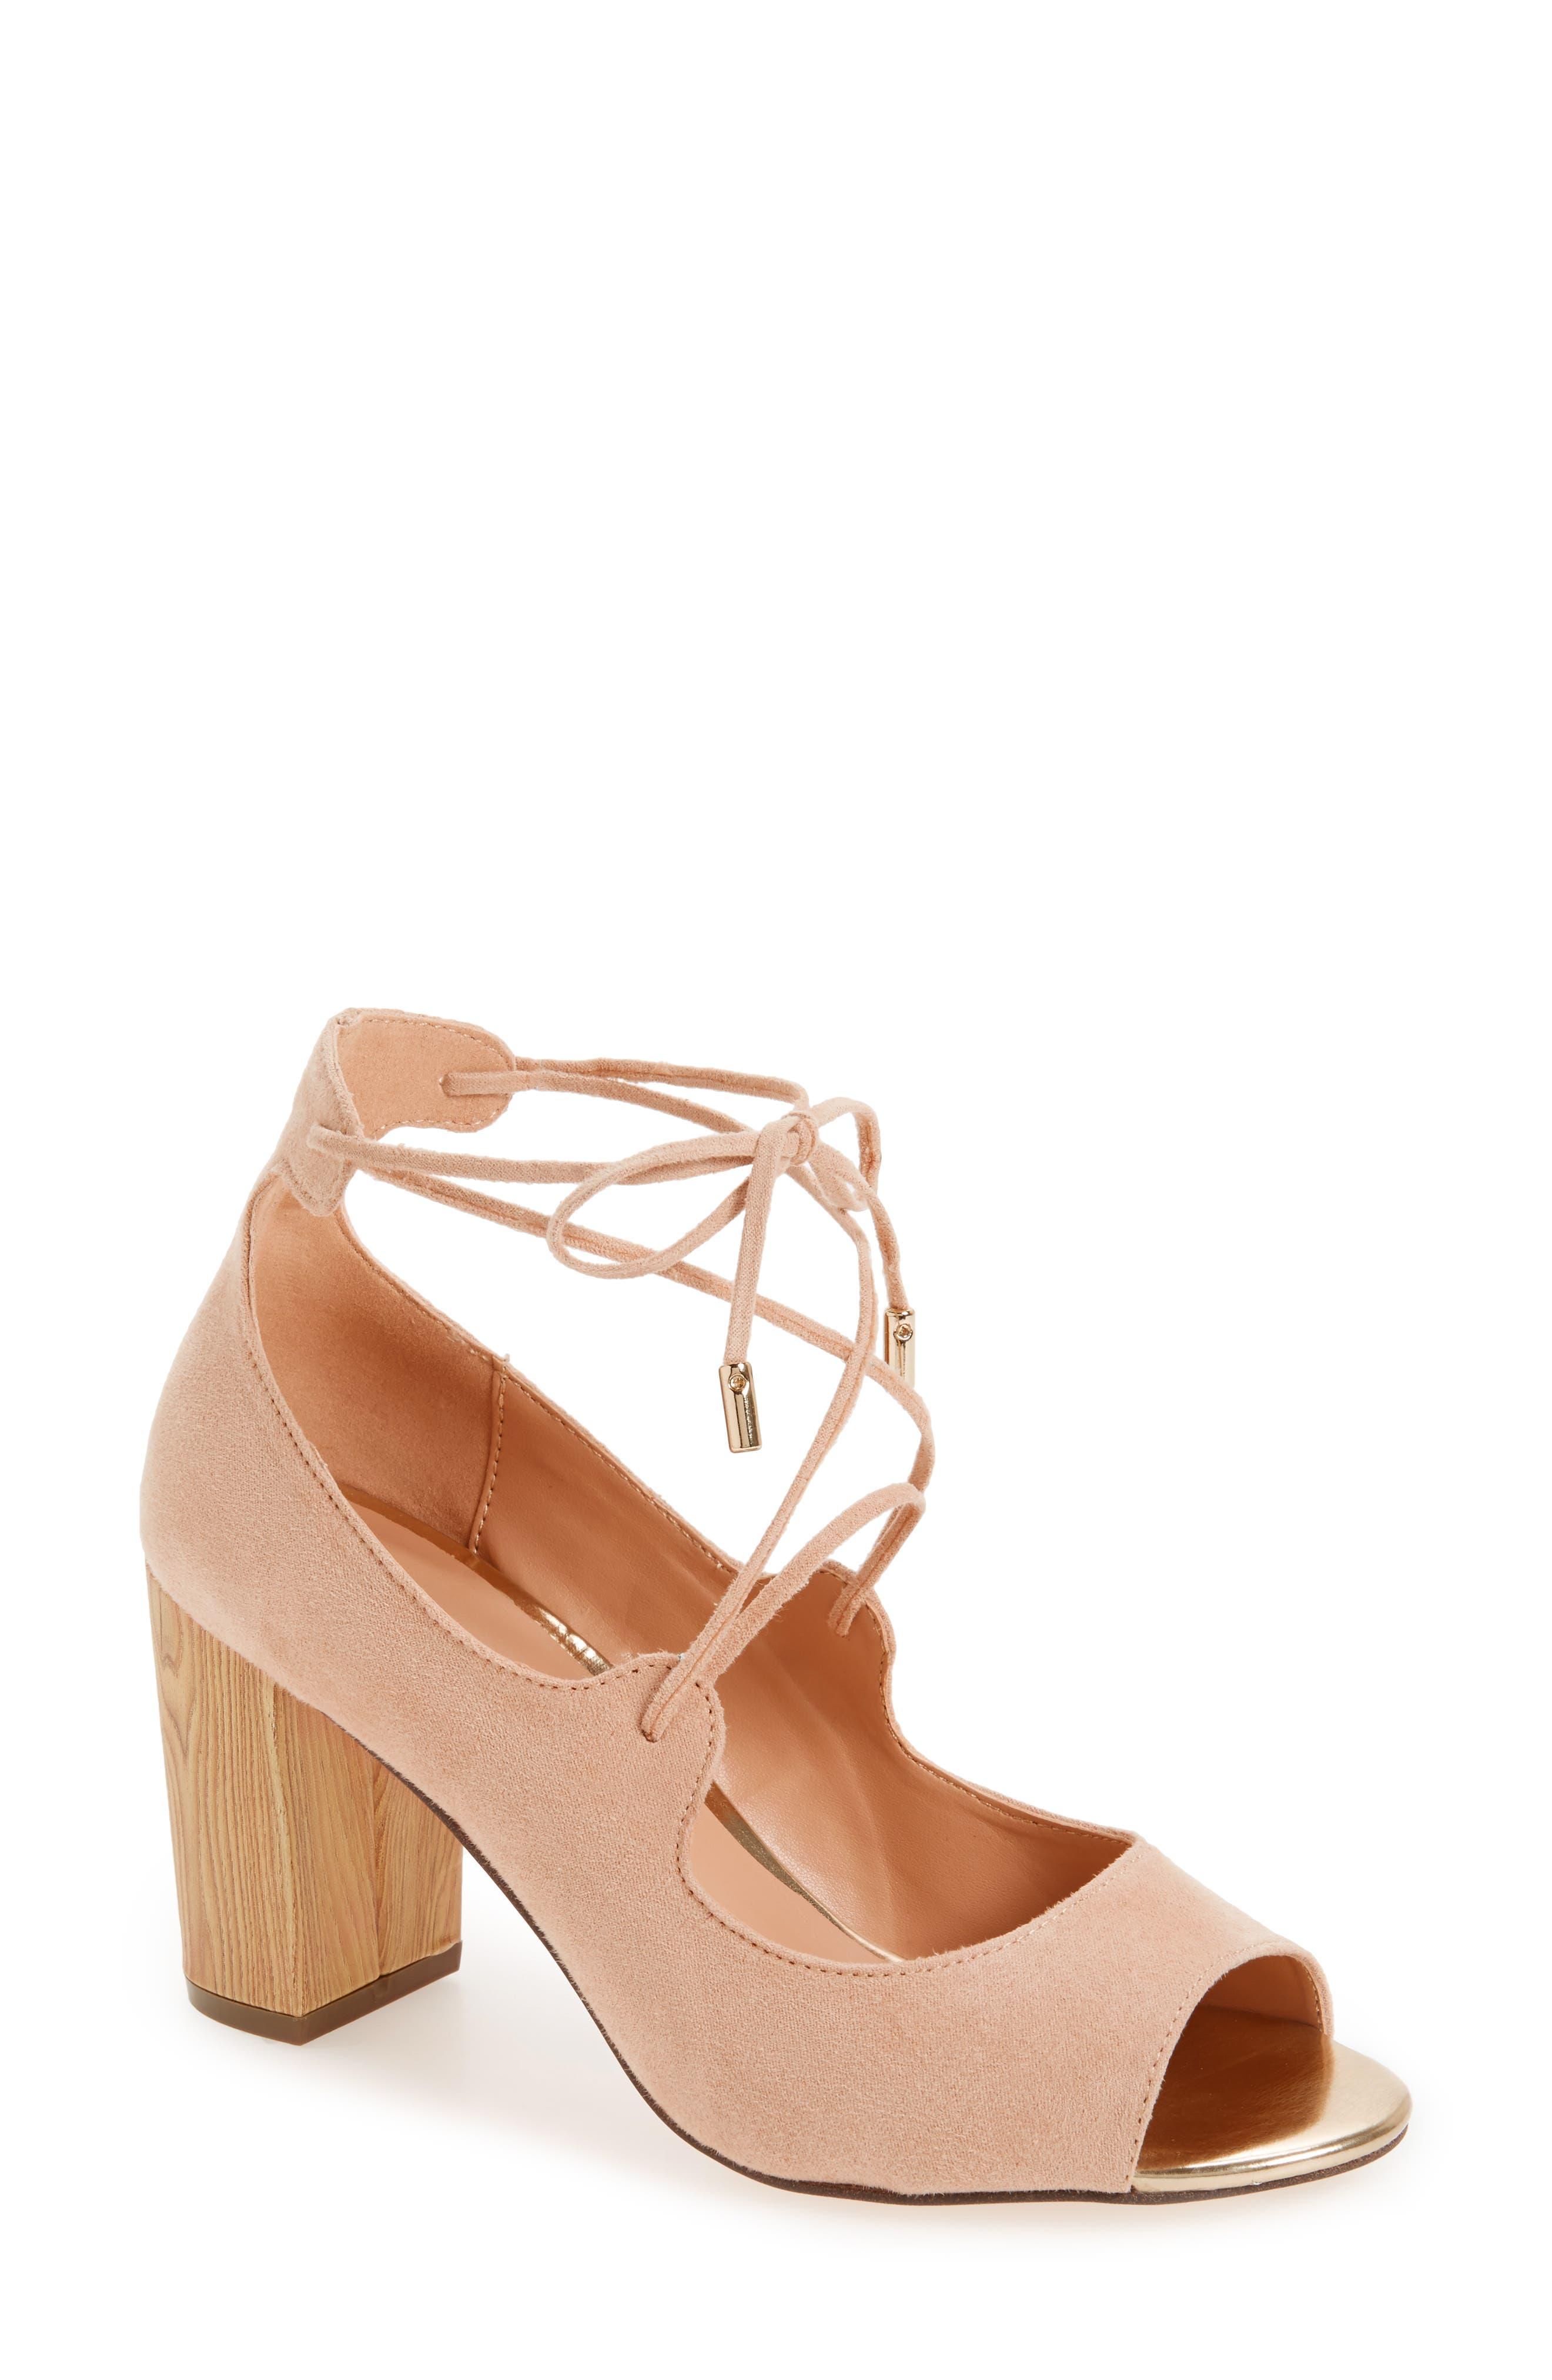 Vikki Block Heel Sandal,                         Main,                         color, Nude Faux Suede